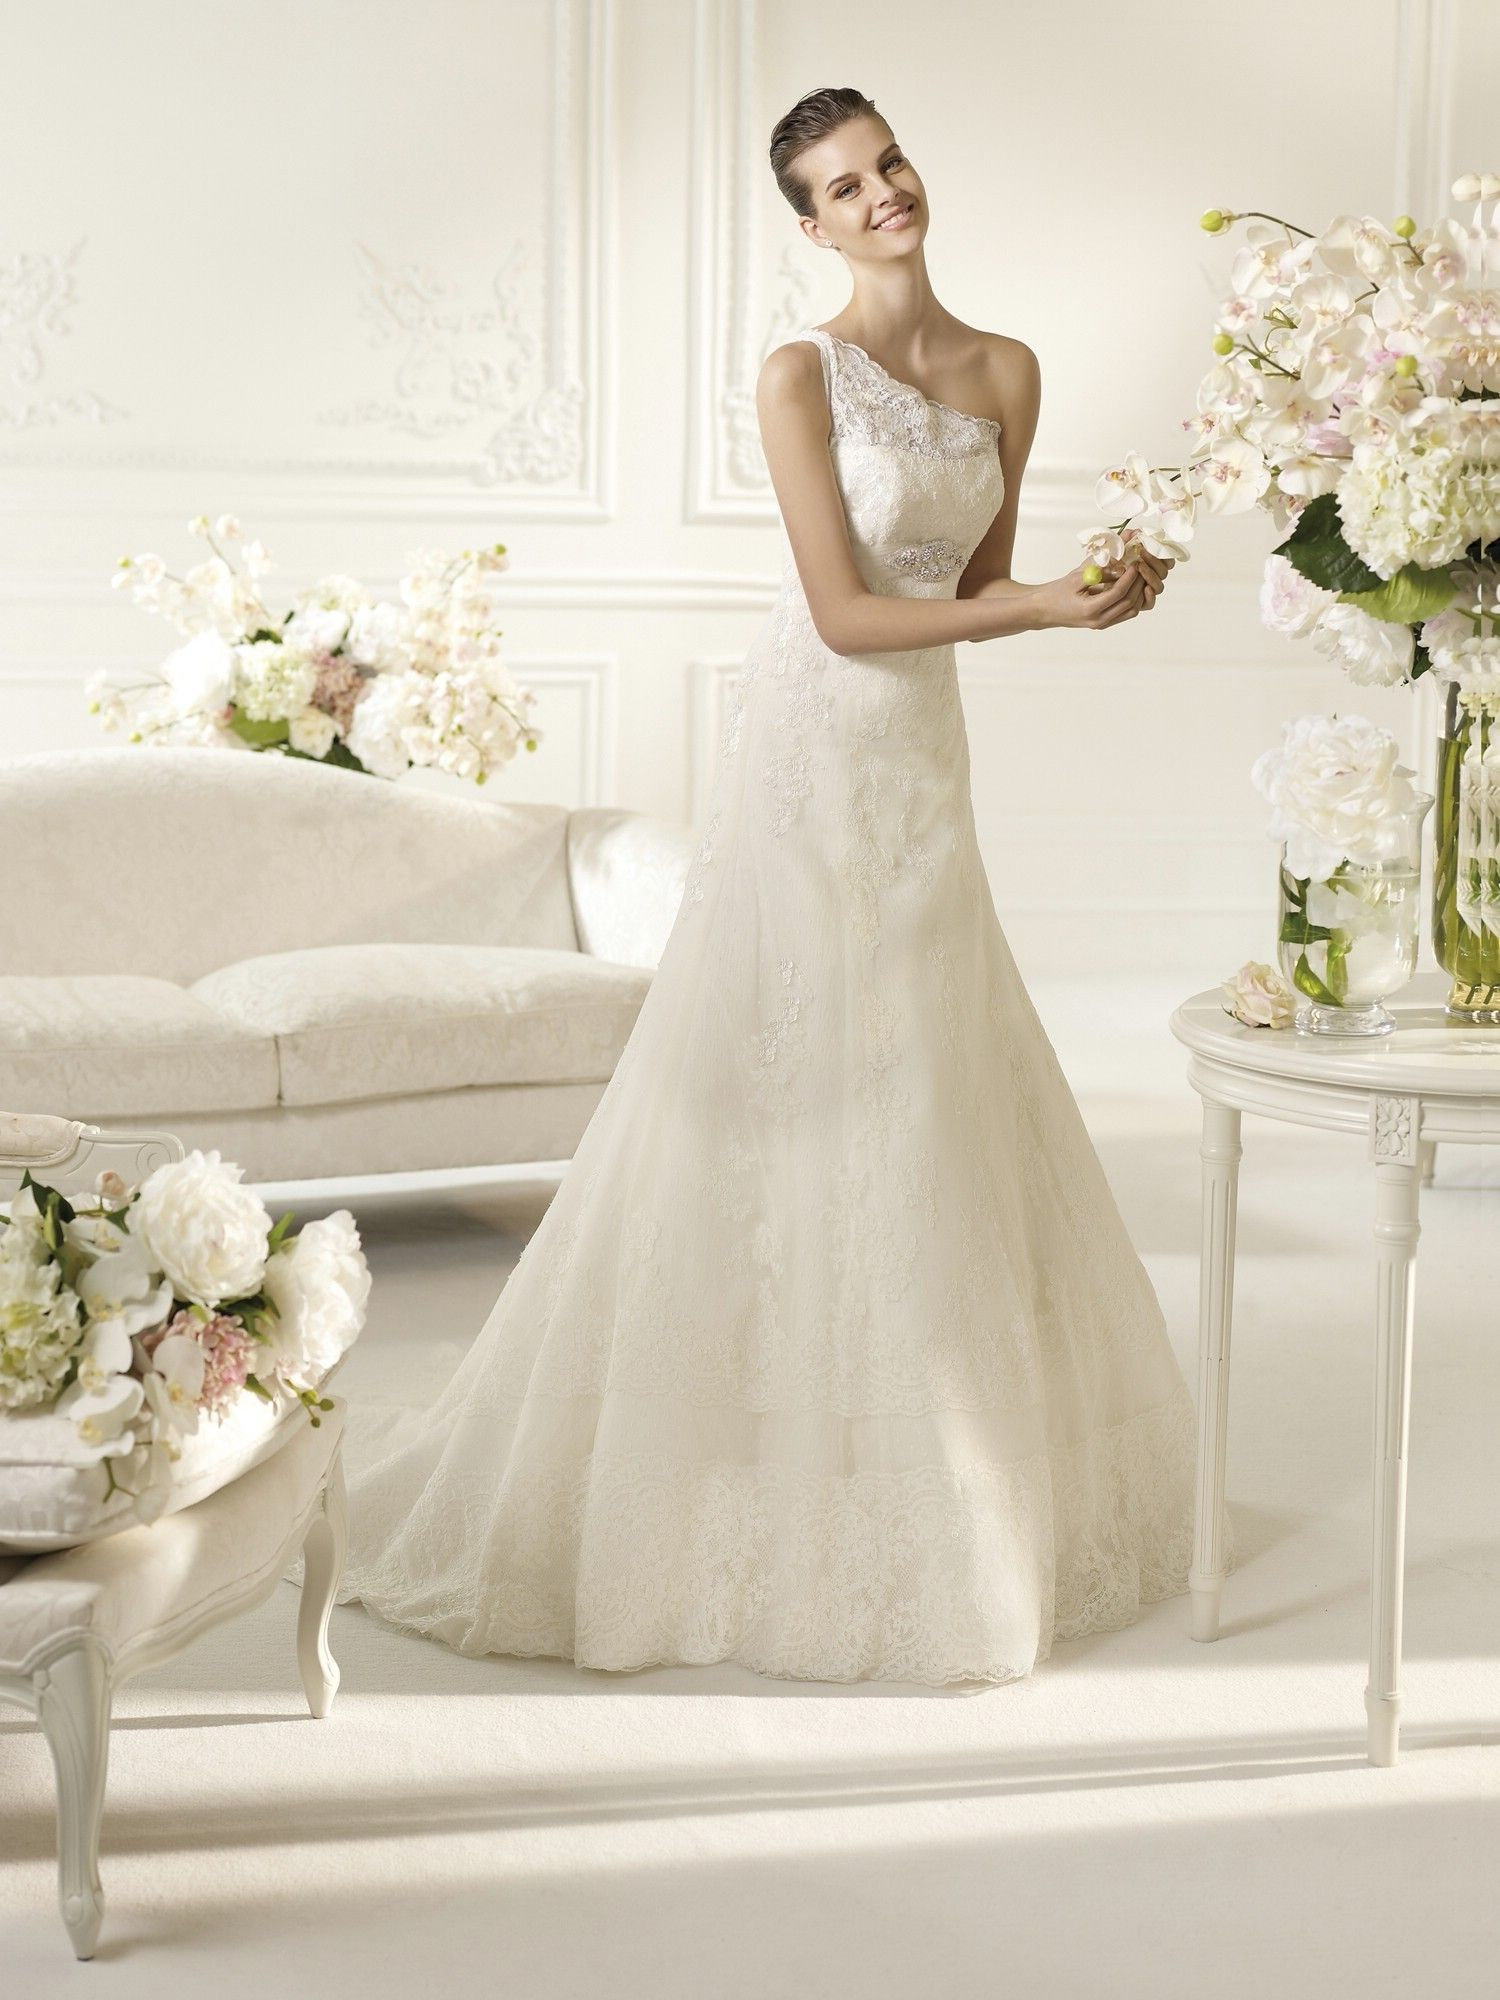 White one wedding dresses style newton newton my dream wedding